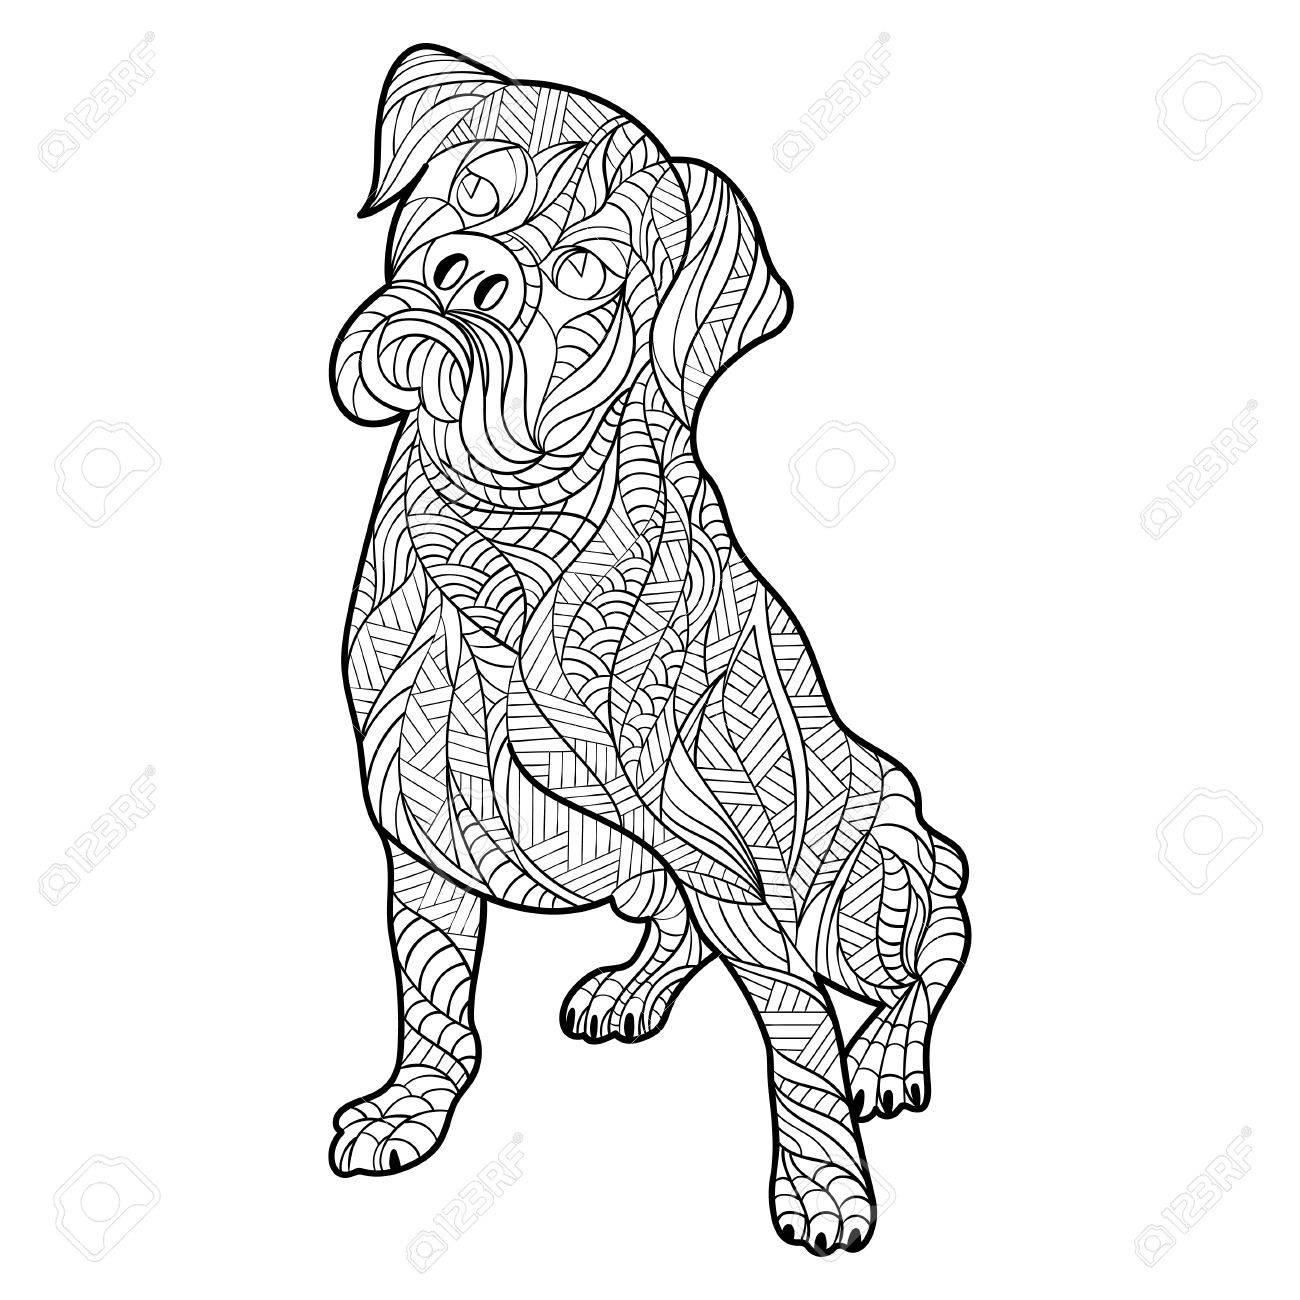 1300x1300 Vector Monochrome Hand Drawn Zentagle Illustration Of Boxer Dog